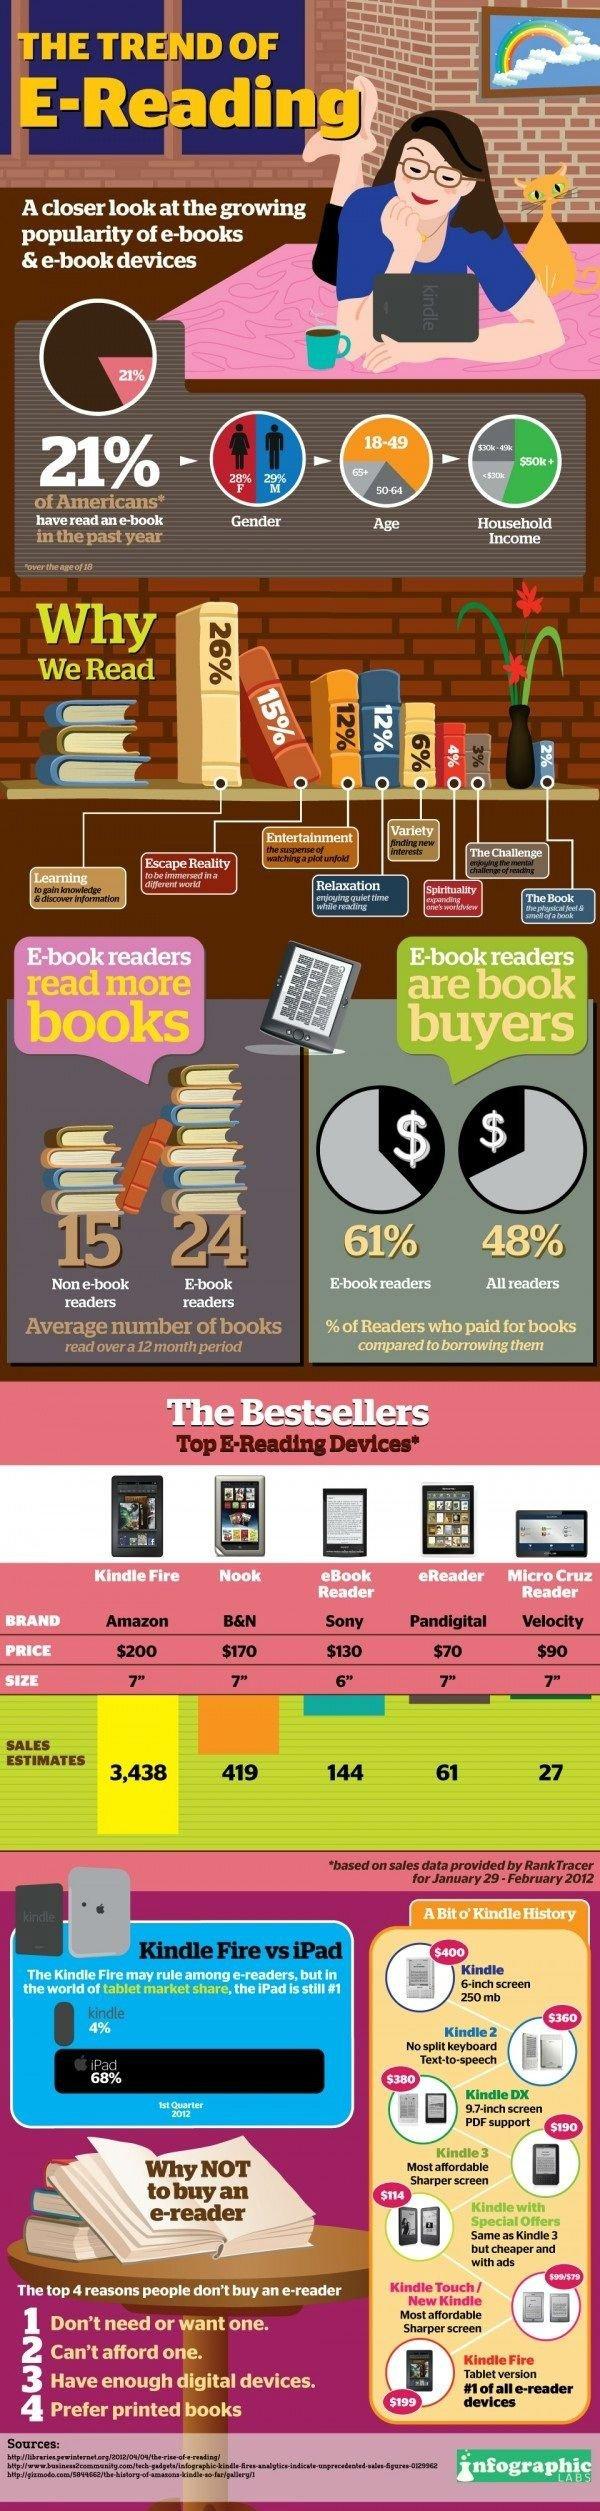 advertising,screenshot,comics,TREND,E-Readin,